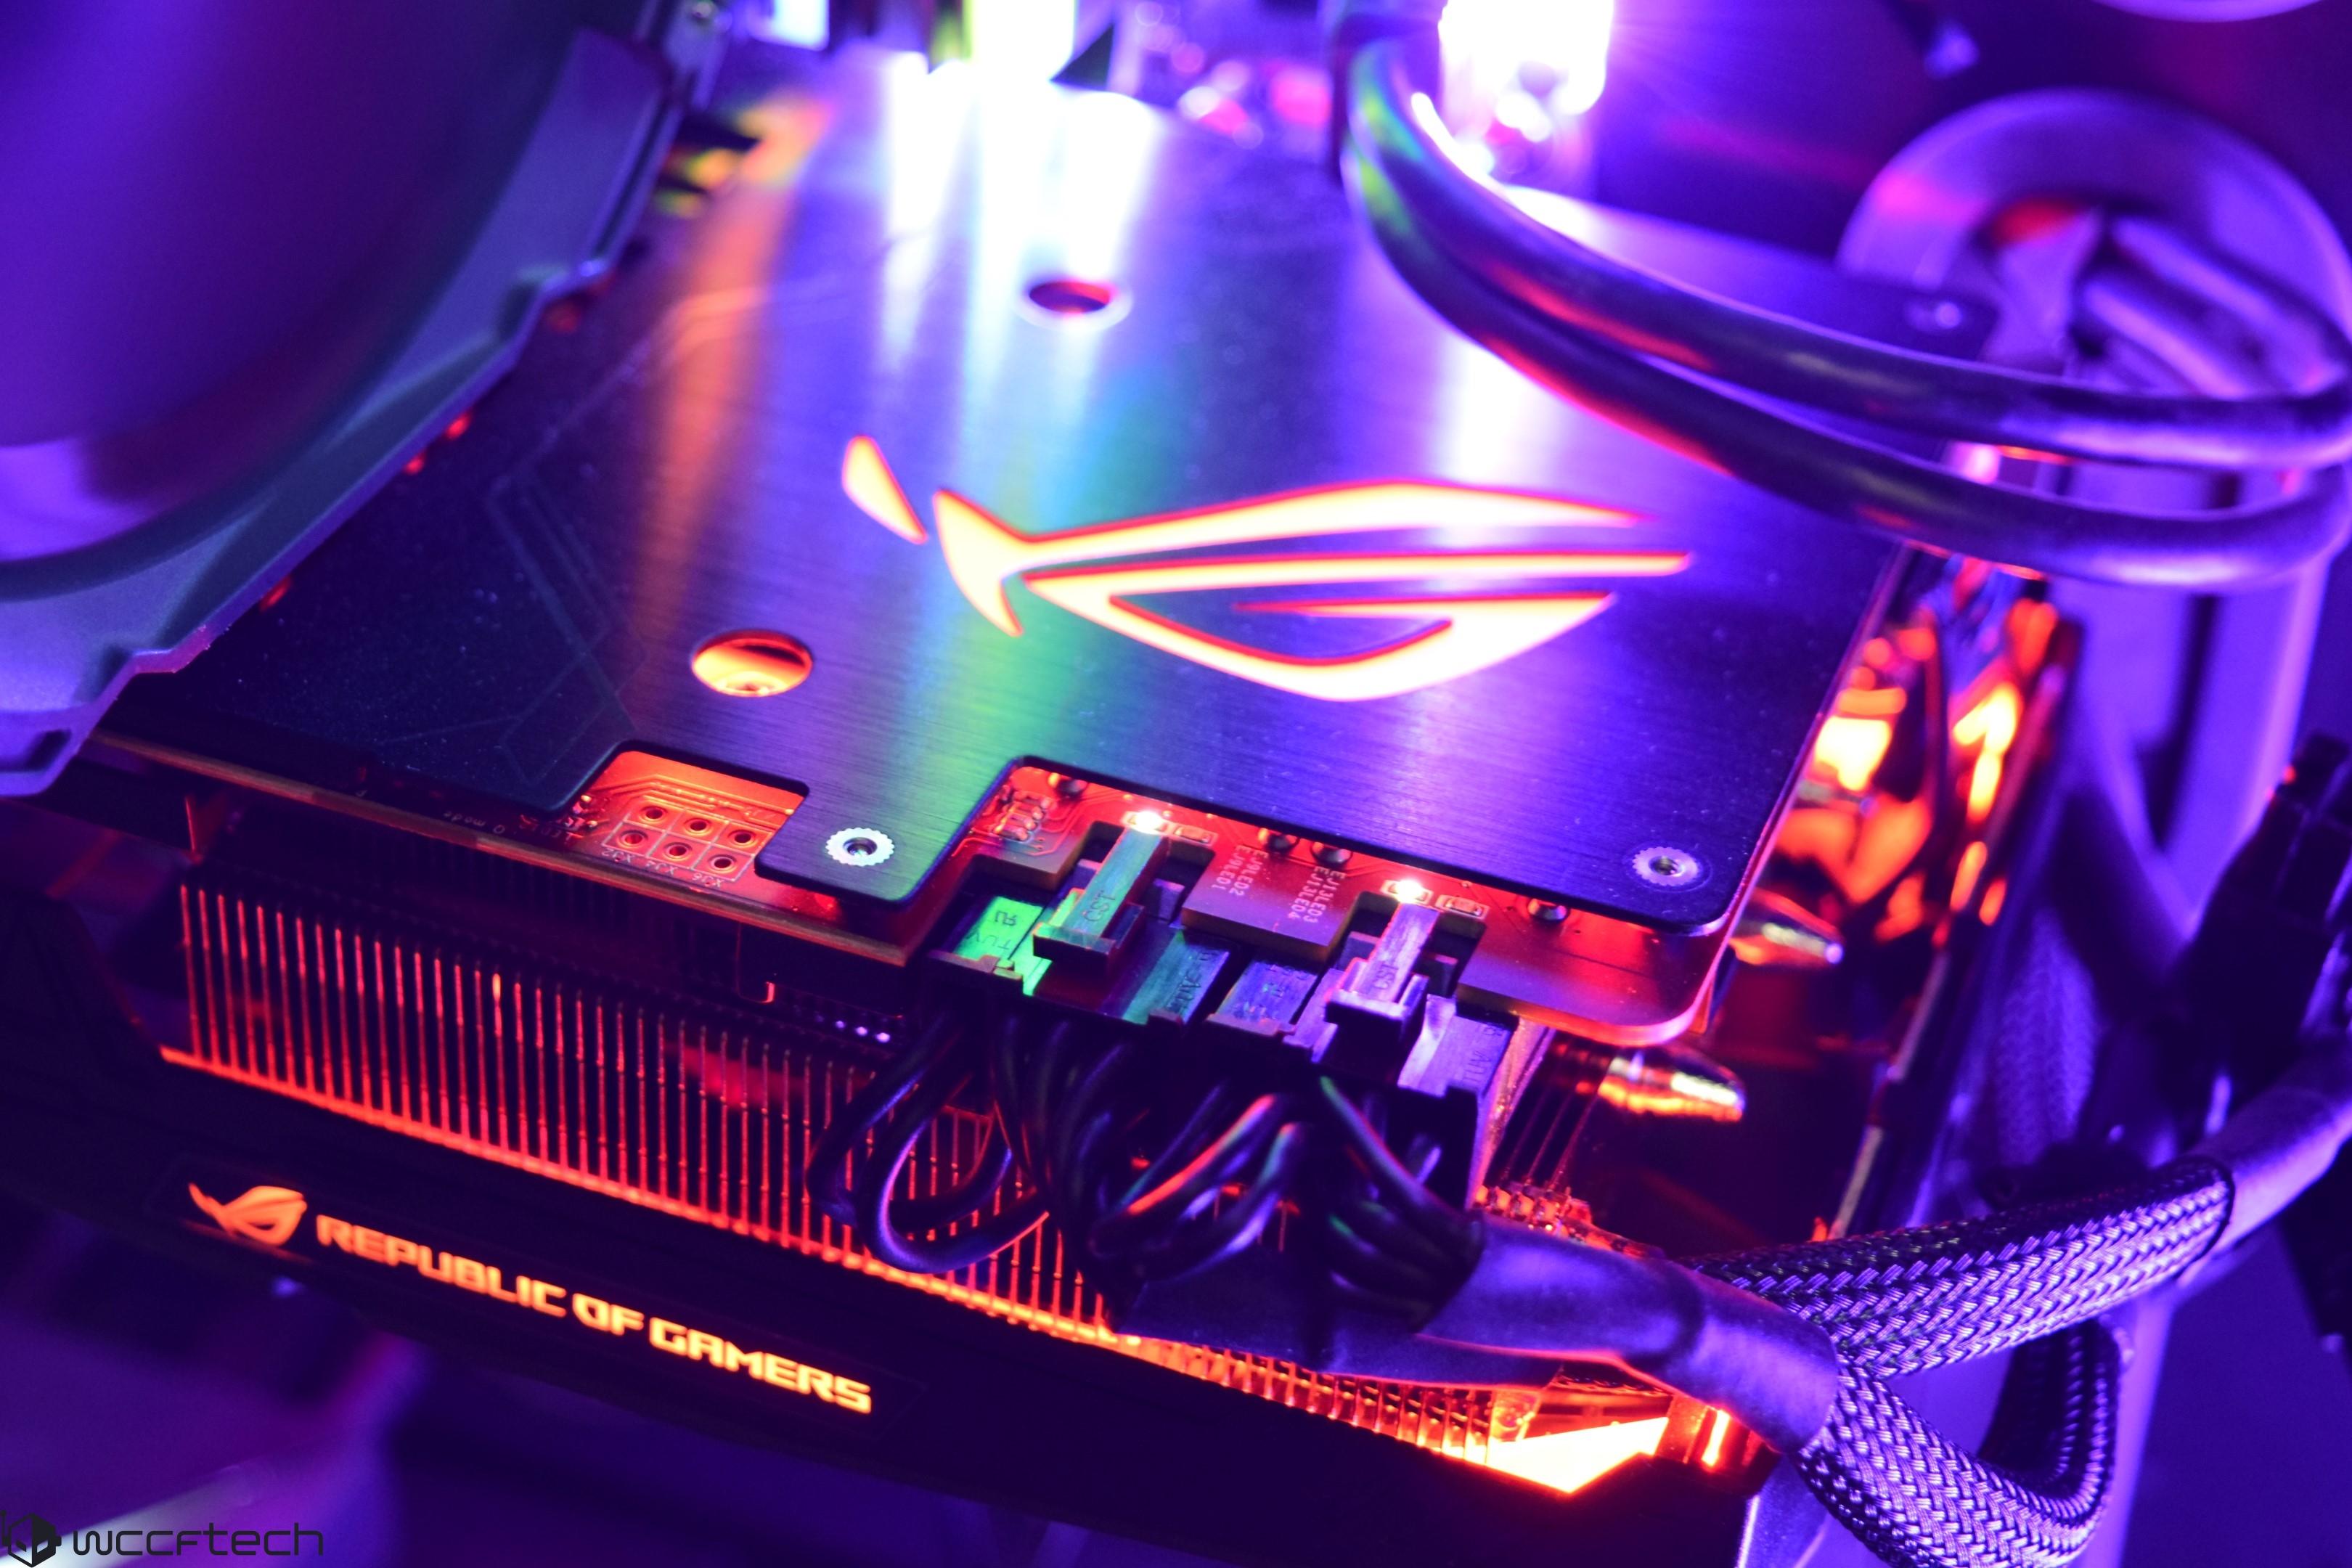 ASUS ROG STRIX GTX 1080 Ti OC Graphics Card Review